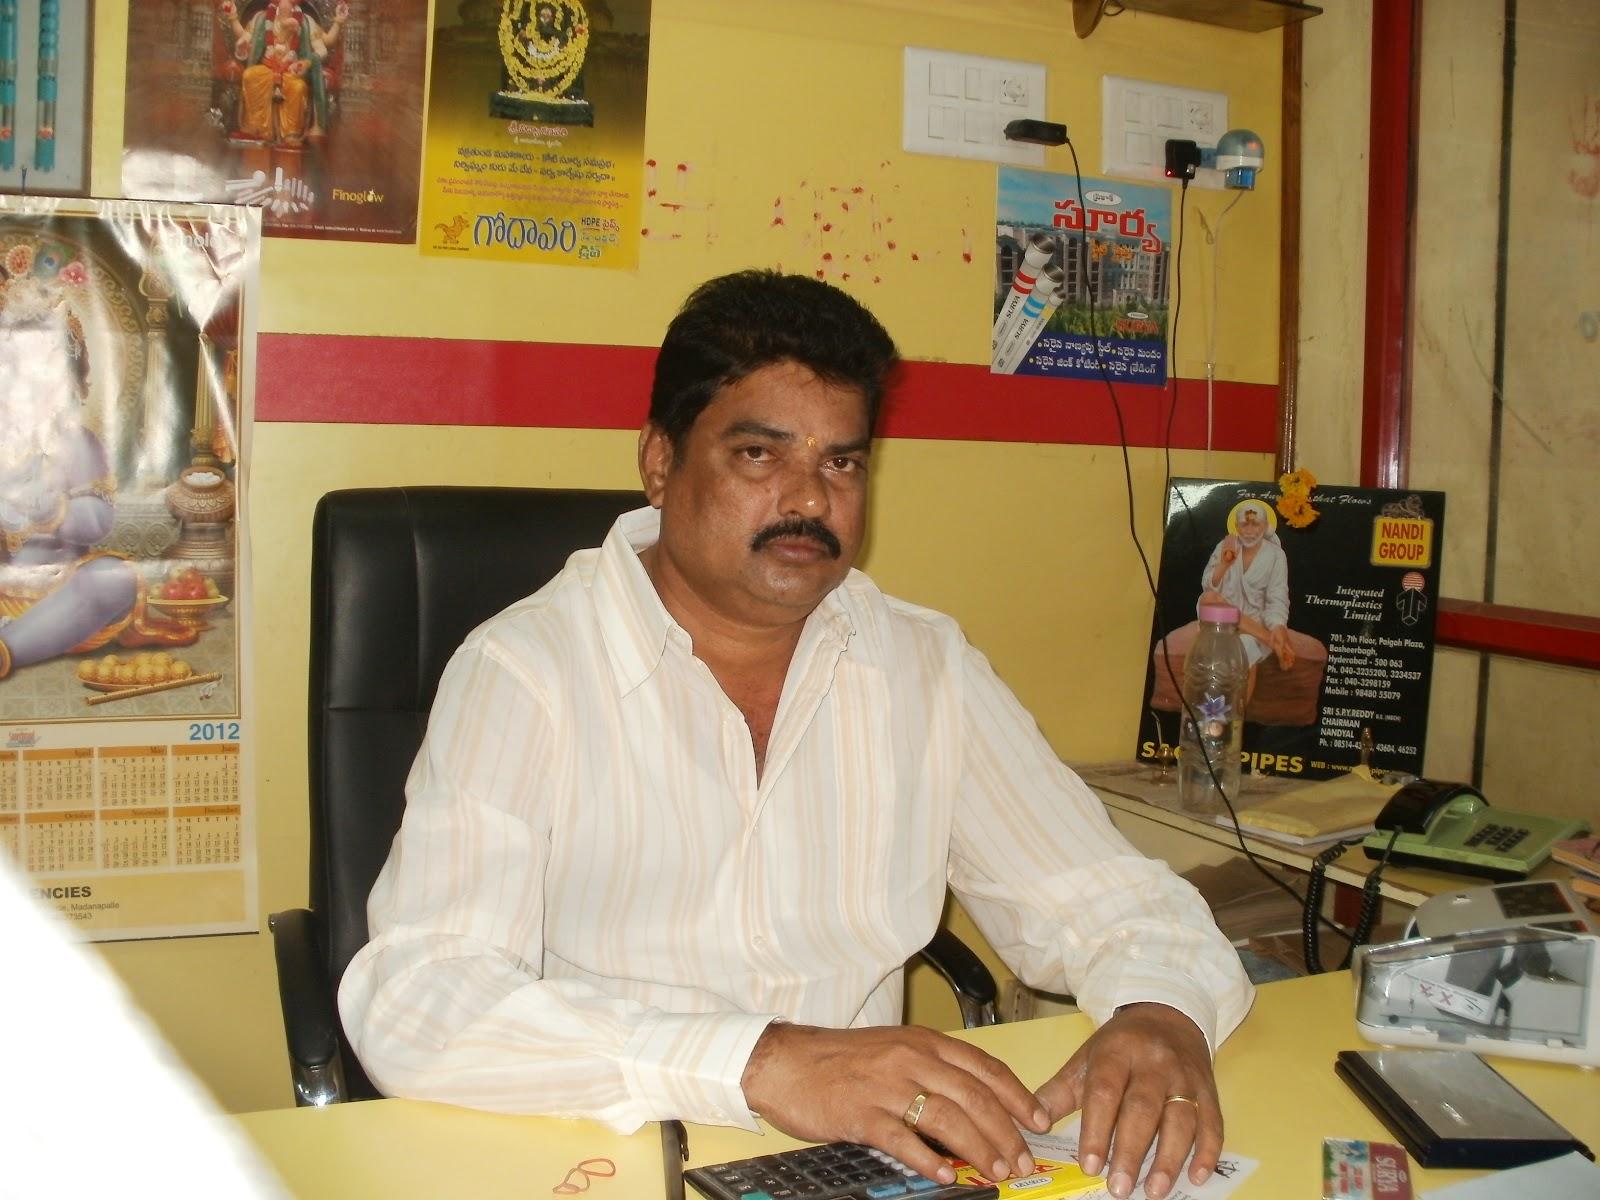 Texmo motors dealers in bangalore dating 3